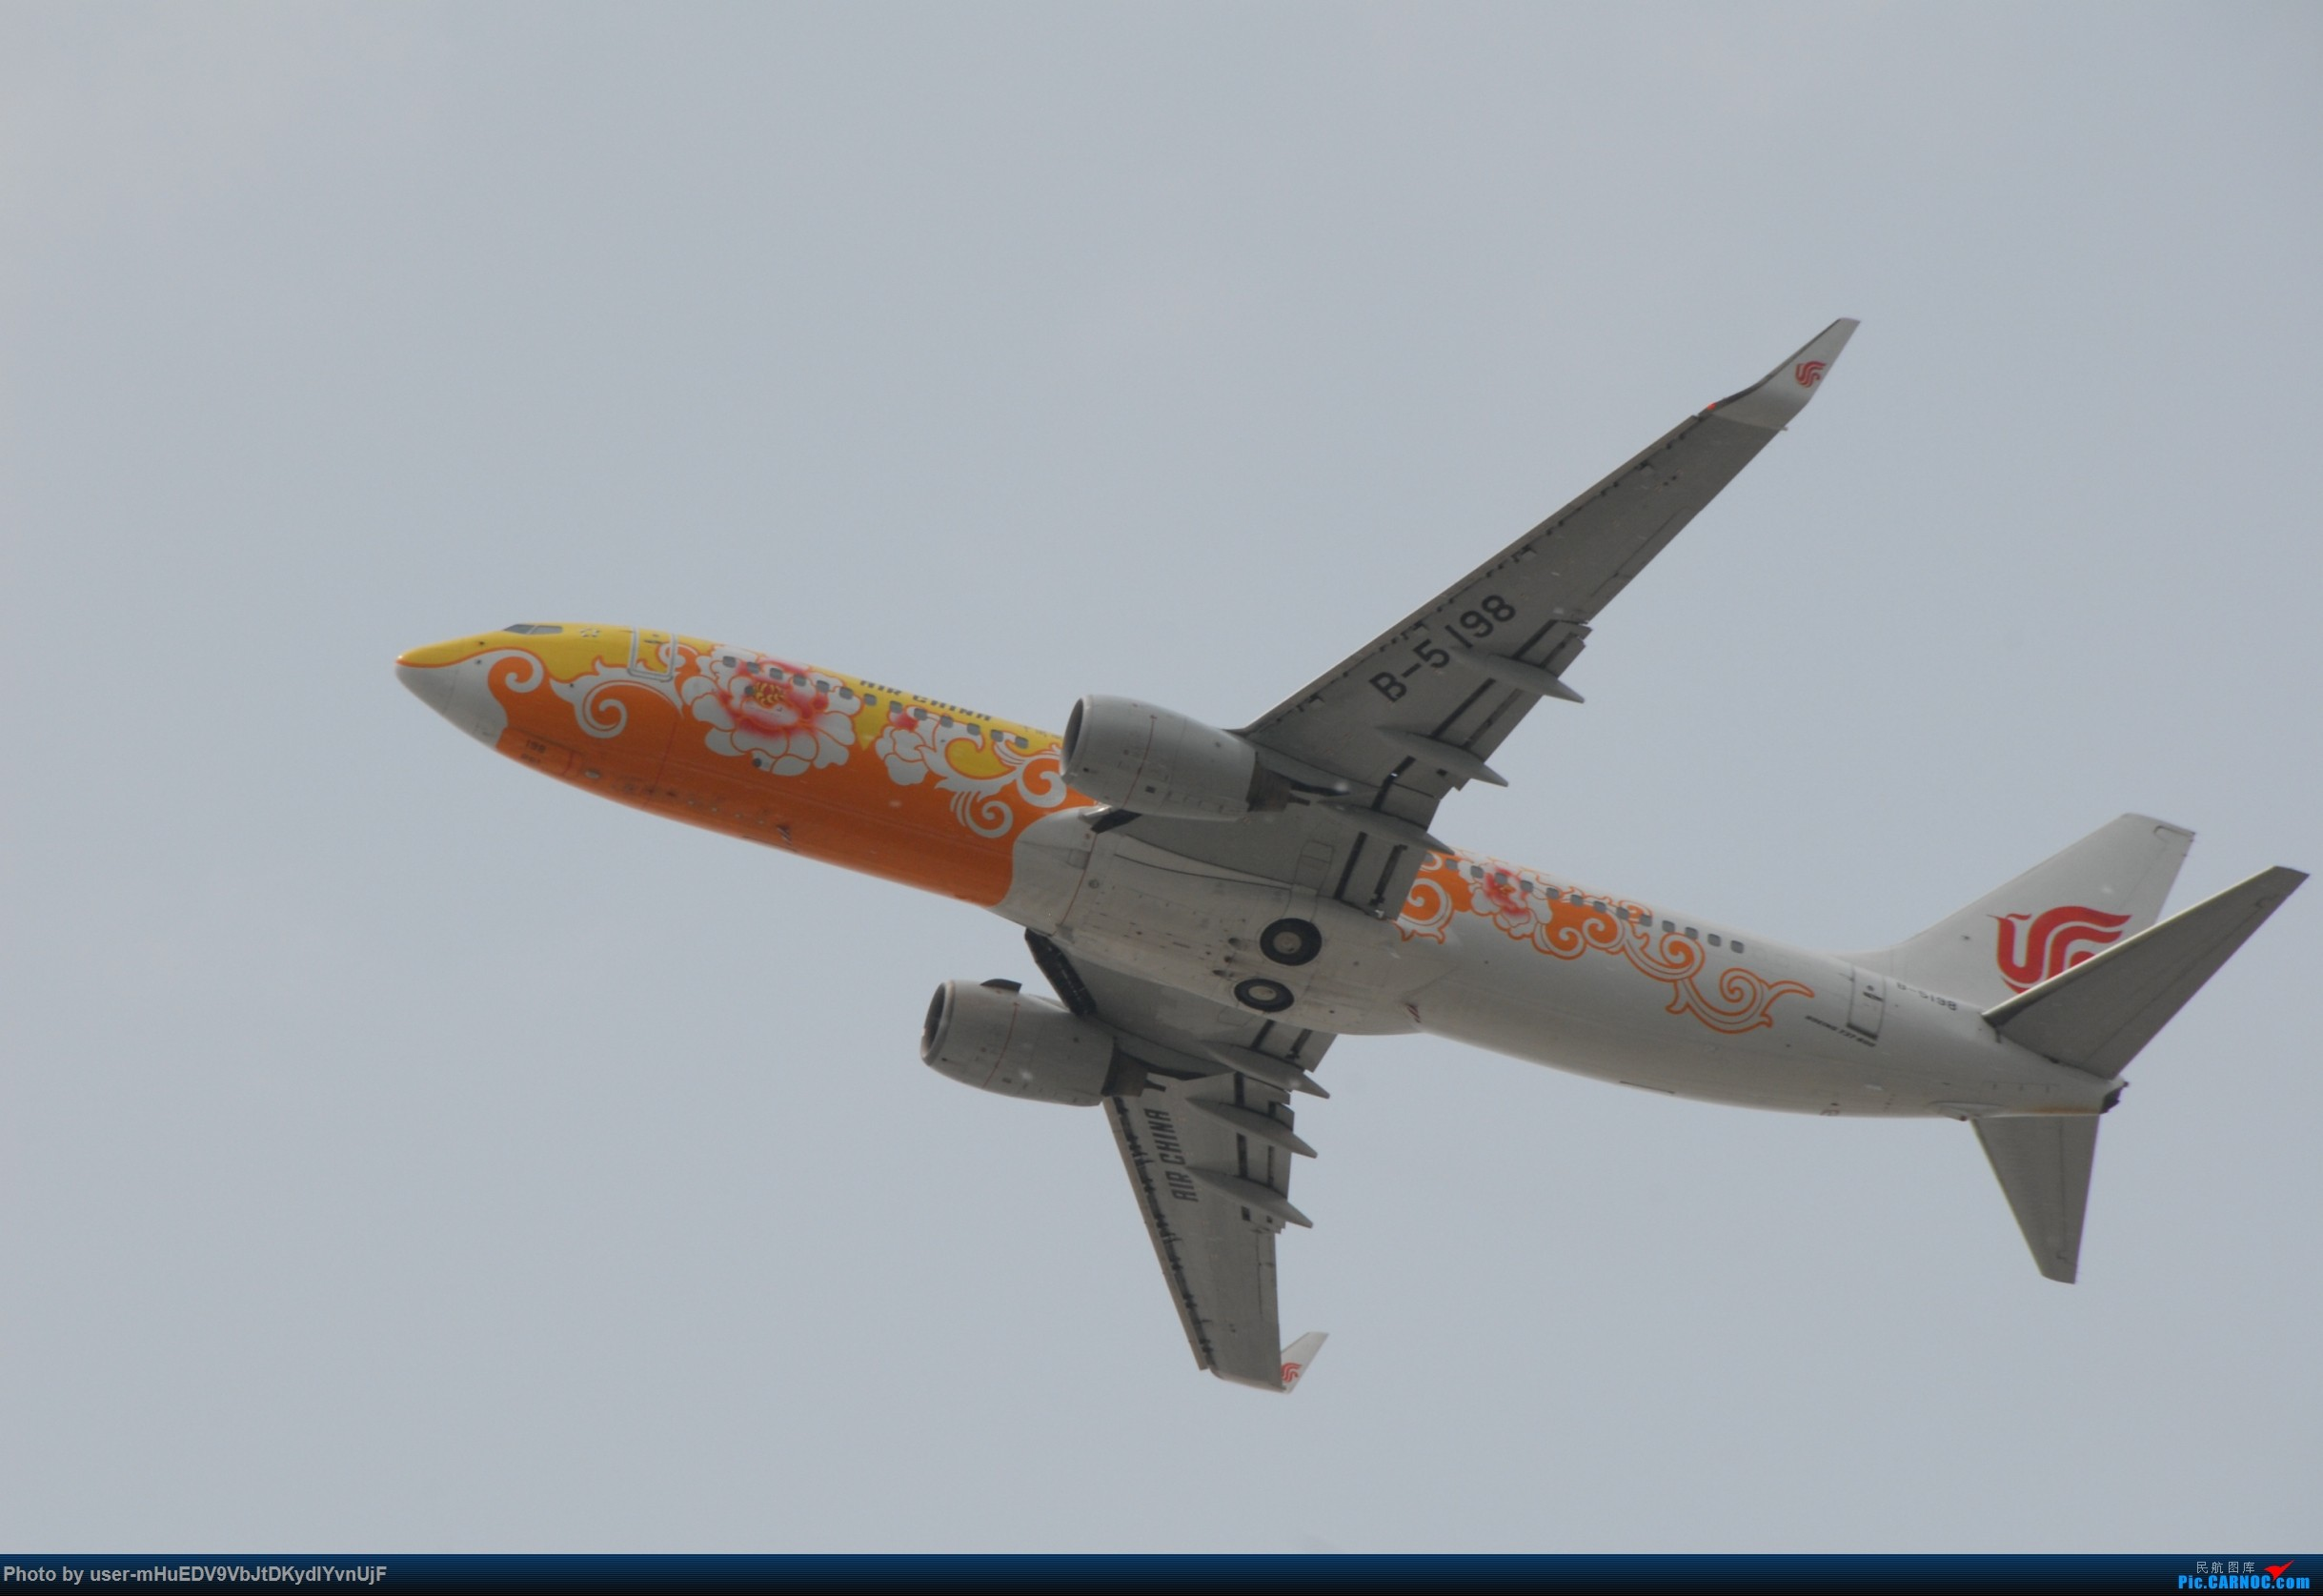 Re:[原创]萌新第一次pek拍机大佬们多多指教〉〉〉 BOEING 737-800 B-5198 中国北京首都国际机场